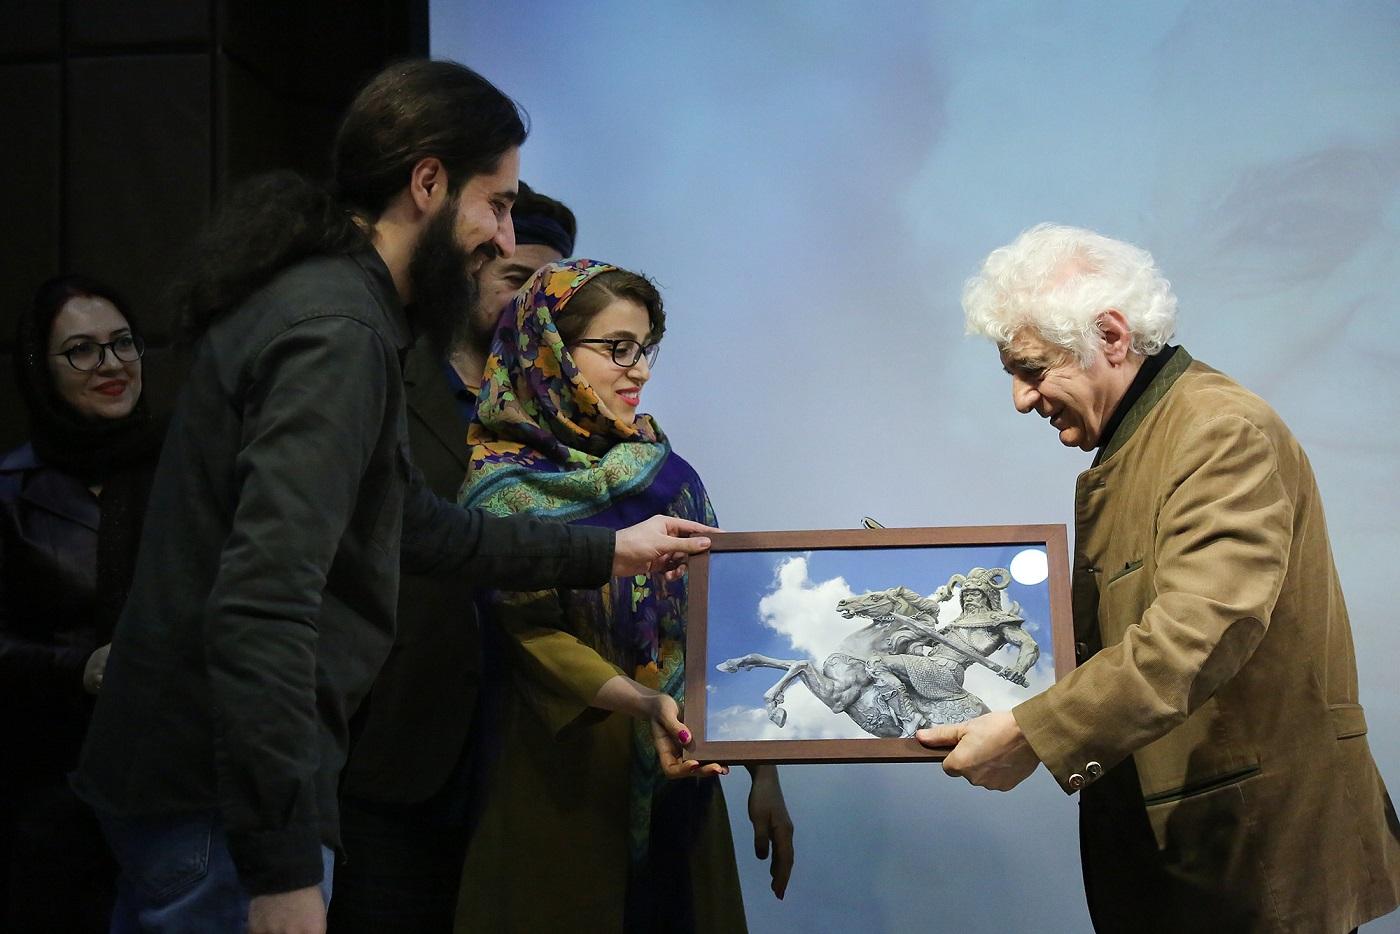 آیین سپاس اپرای رستم و سهراب لوریس چکناوریان